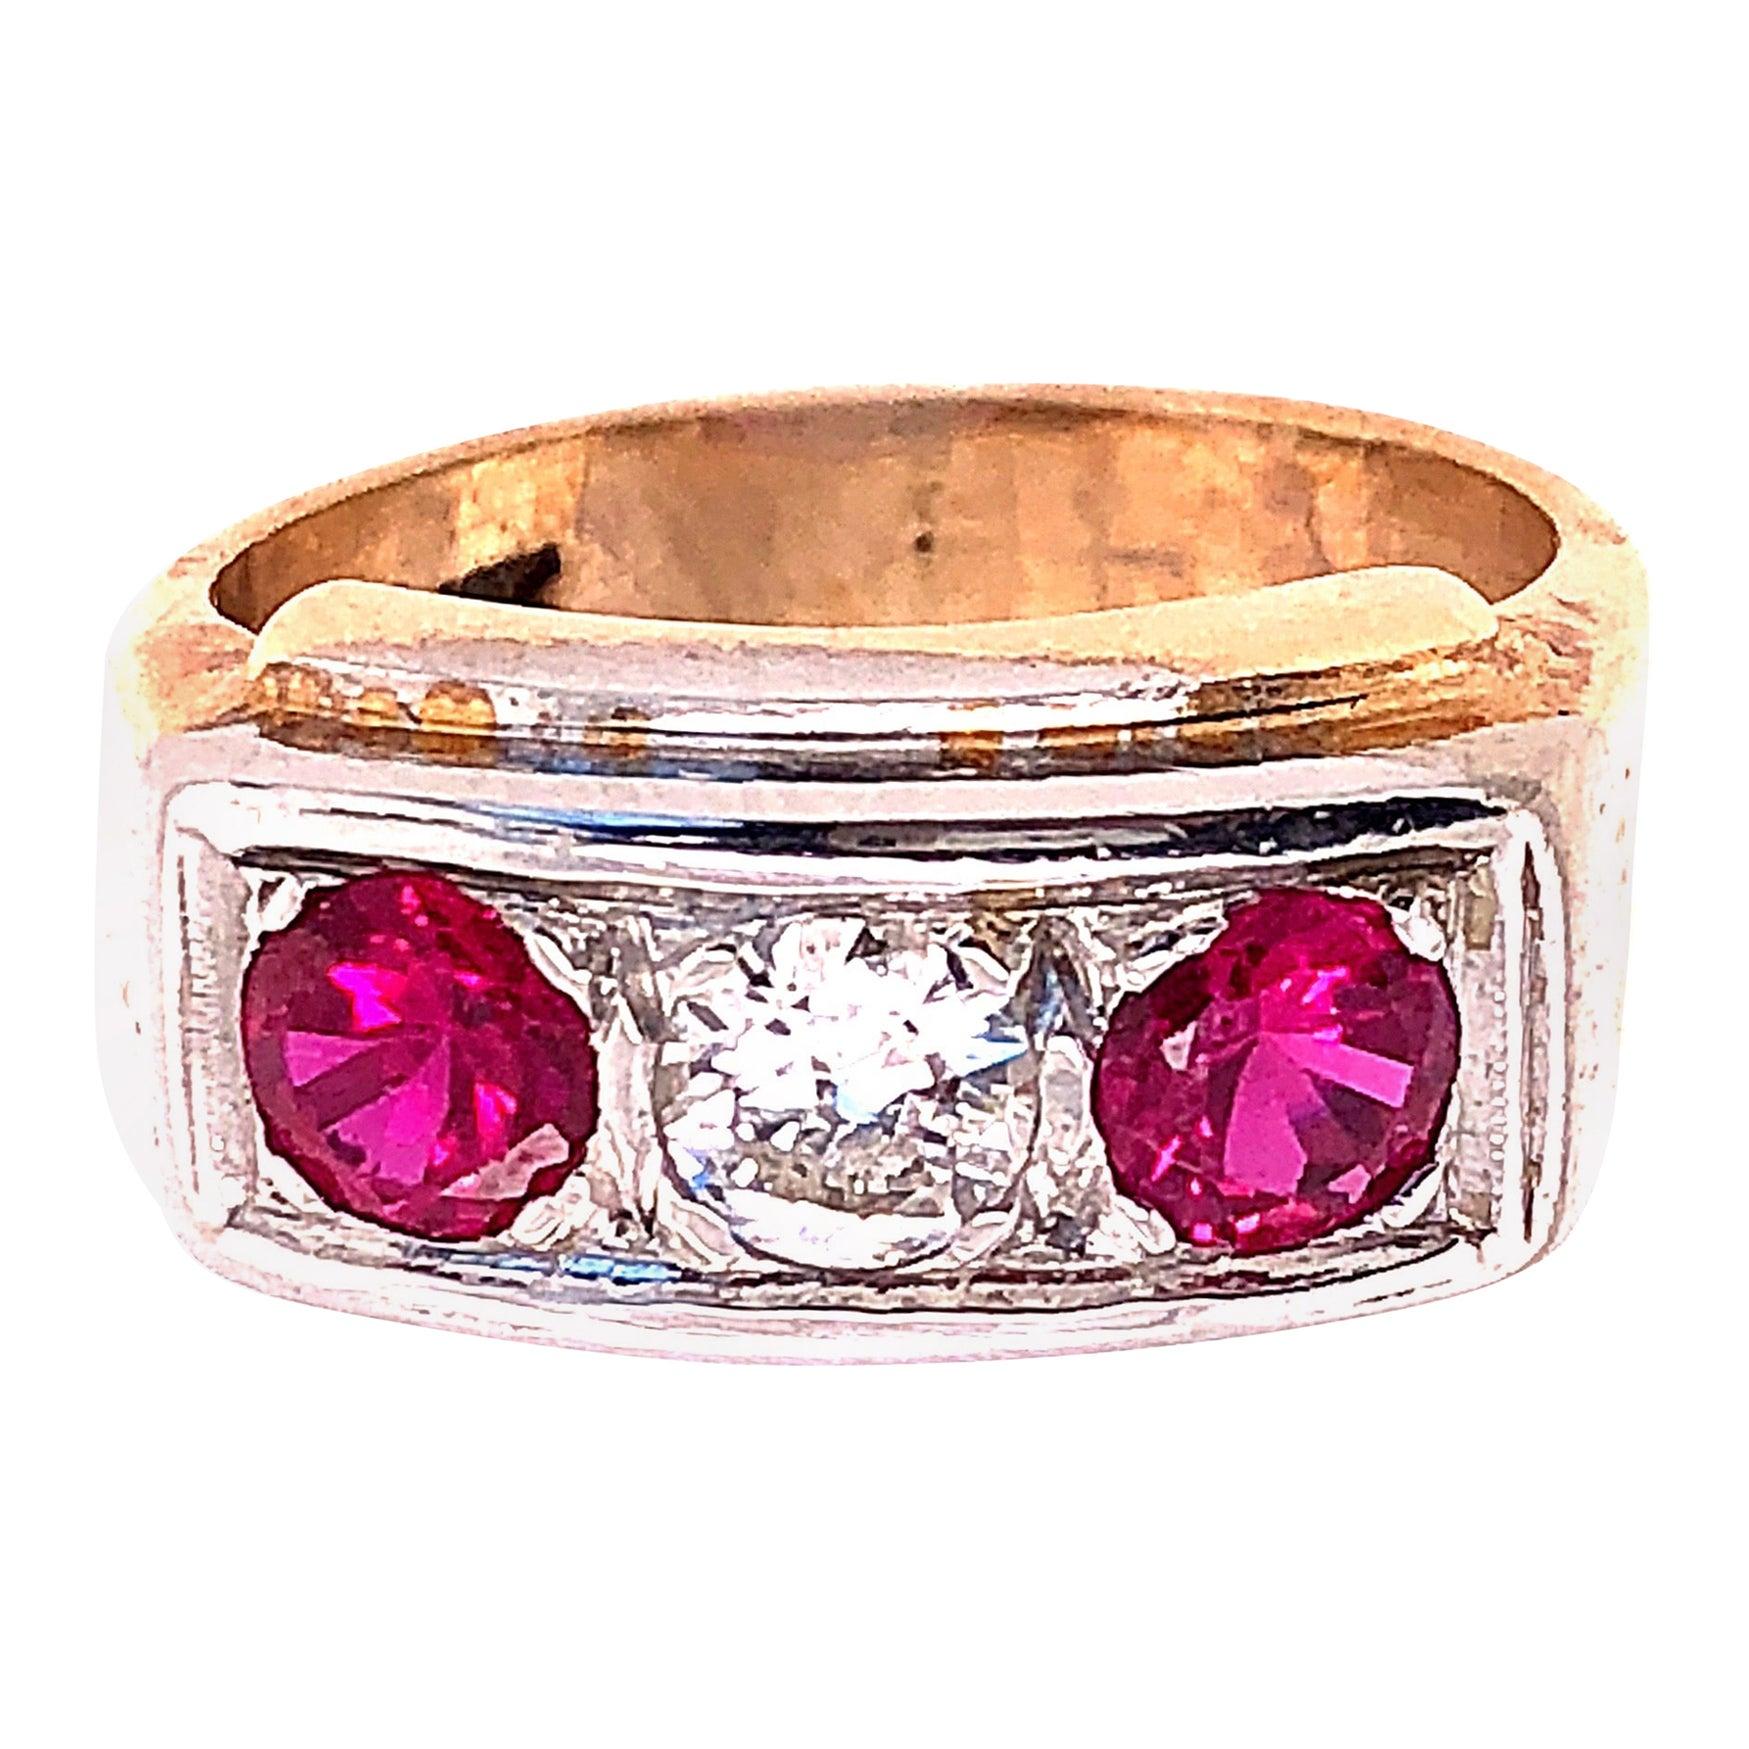 14 Karat Yellow and White Gold Three-Stone Diamond and Ruby Band Ring